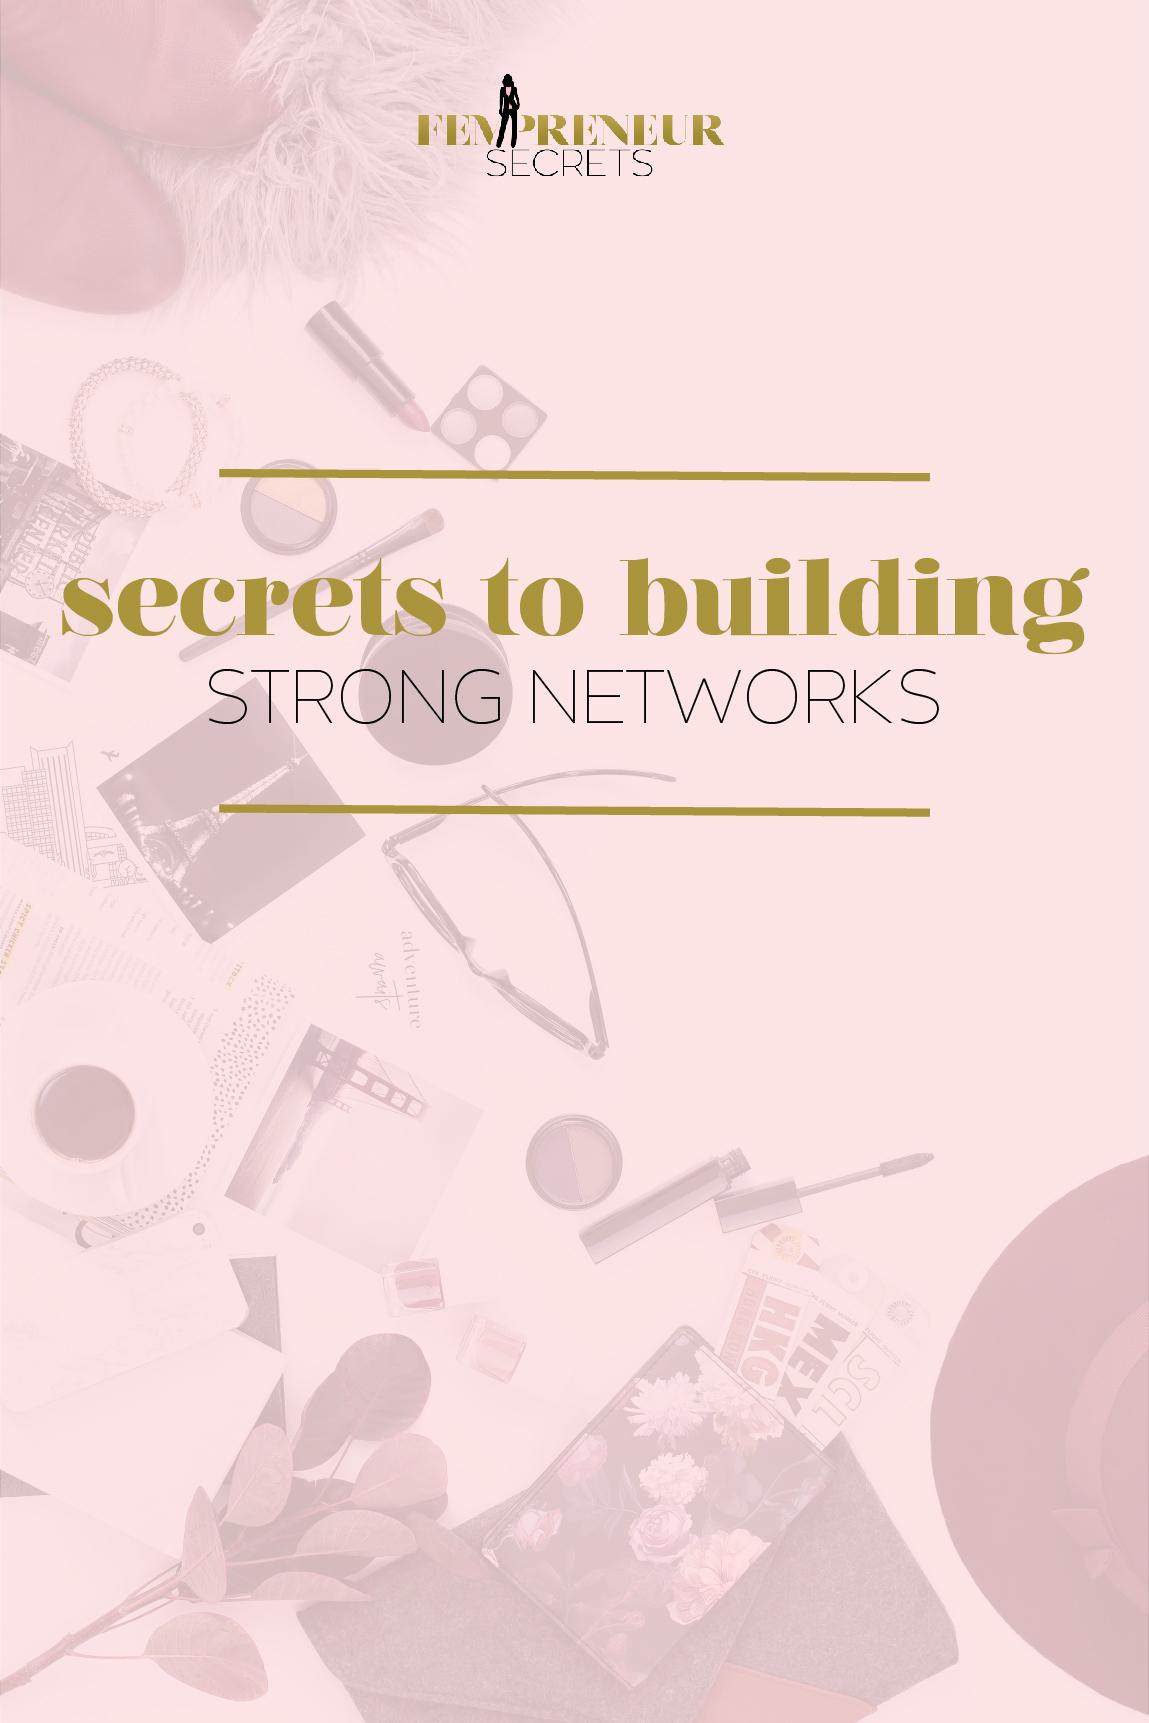 026 Secrets to Building Strong Networks_Pinterest 2.jpg